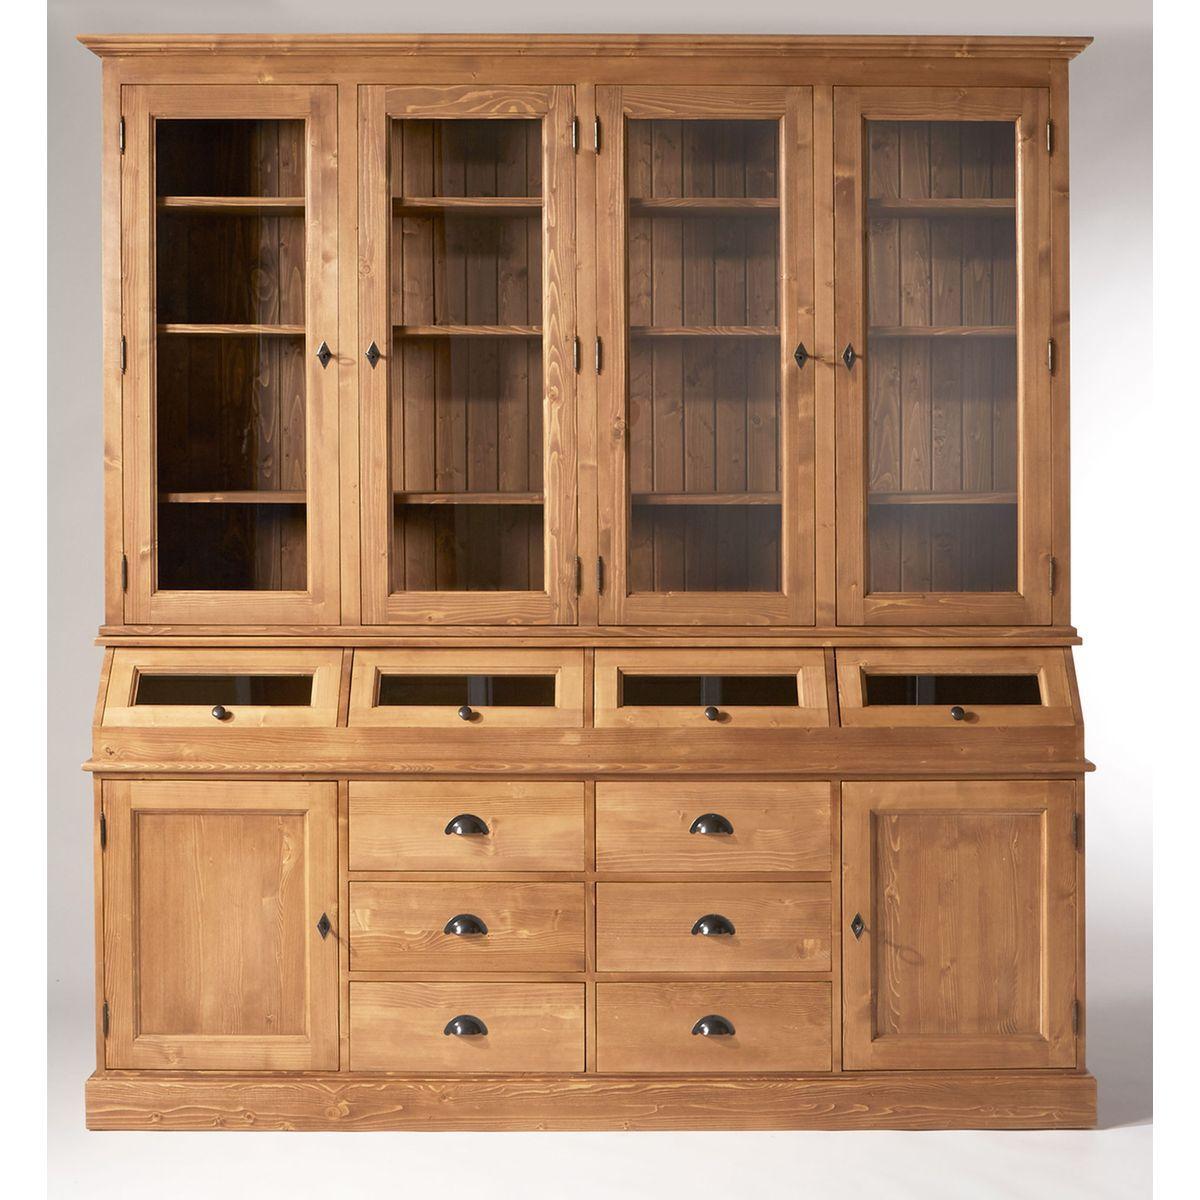 meuble vaisselier made in meubles 4 trappes en pin massif cir miel prix promo vaisselier la. Black Bedroom Furniture Sets. Home Design Ideas